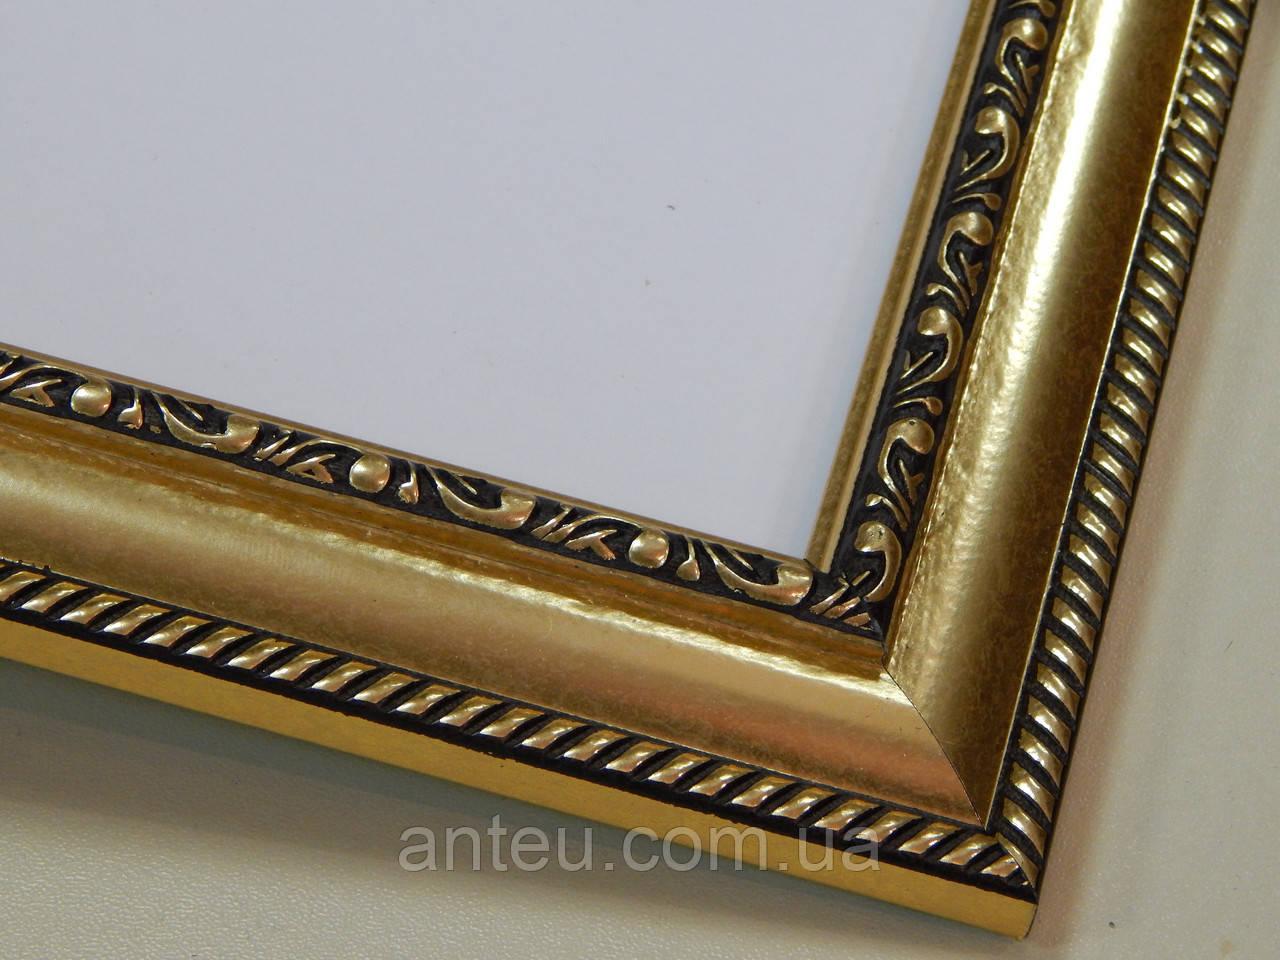 Фоторамка А2 (420х594)Антибликовое стекло29 мм.золото с орнаментом.Для фото ,грамот,картин.